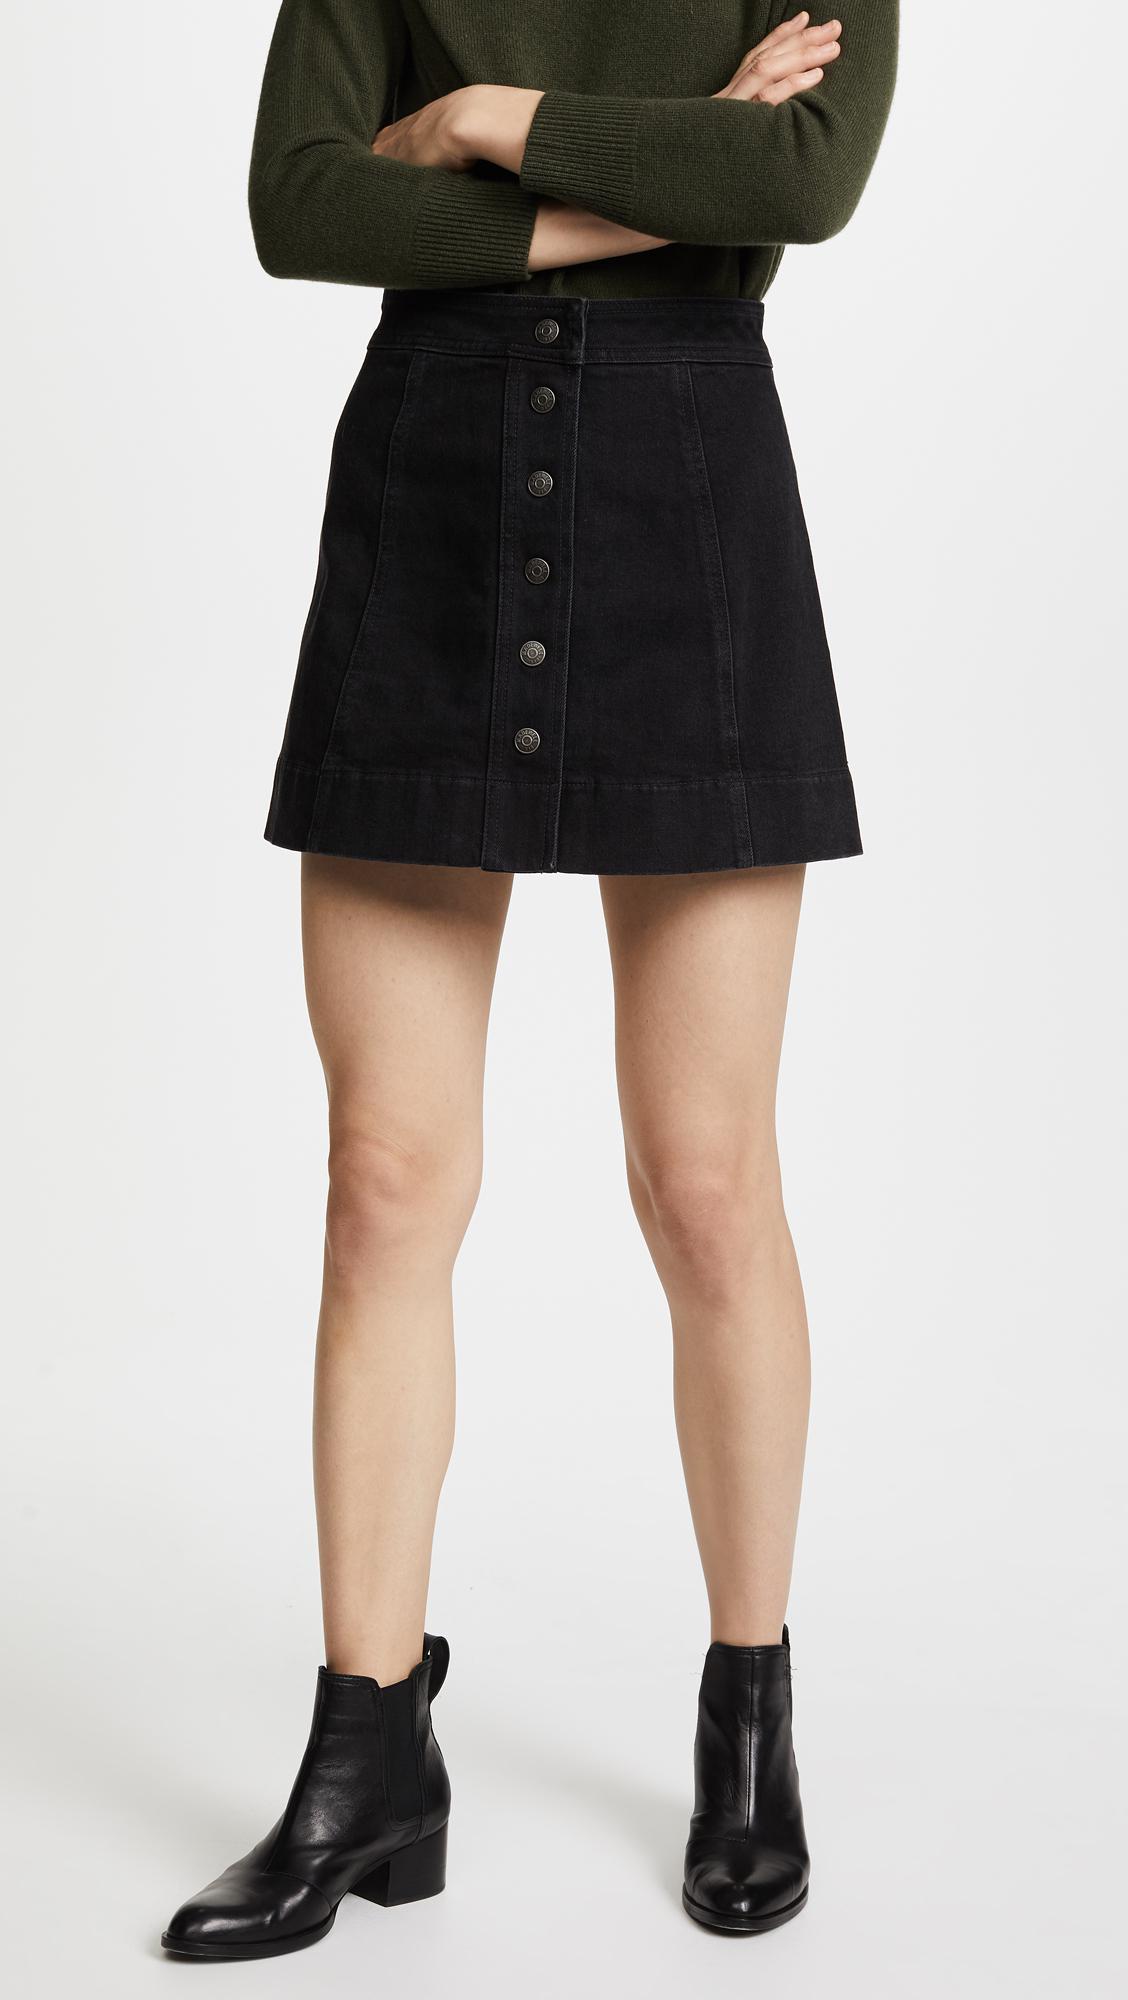 0c51806e66 Madewell Denim Button Front Miniskirt in Black - Lyst